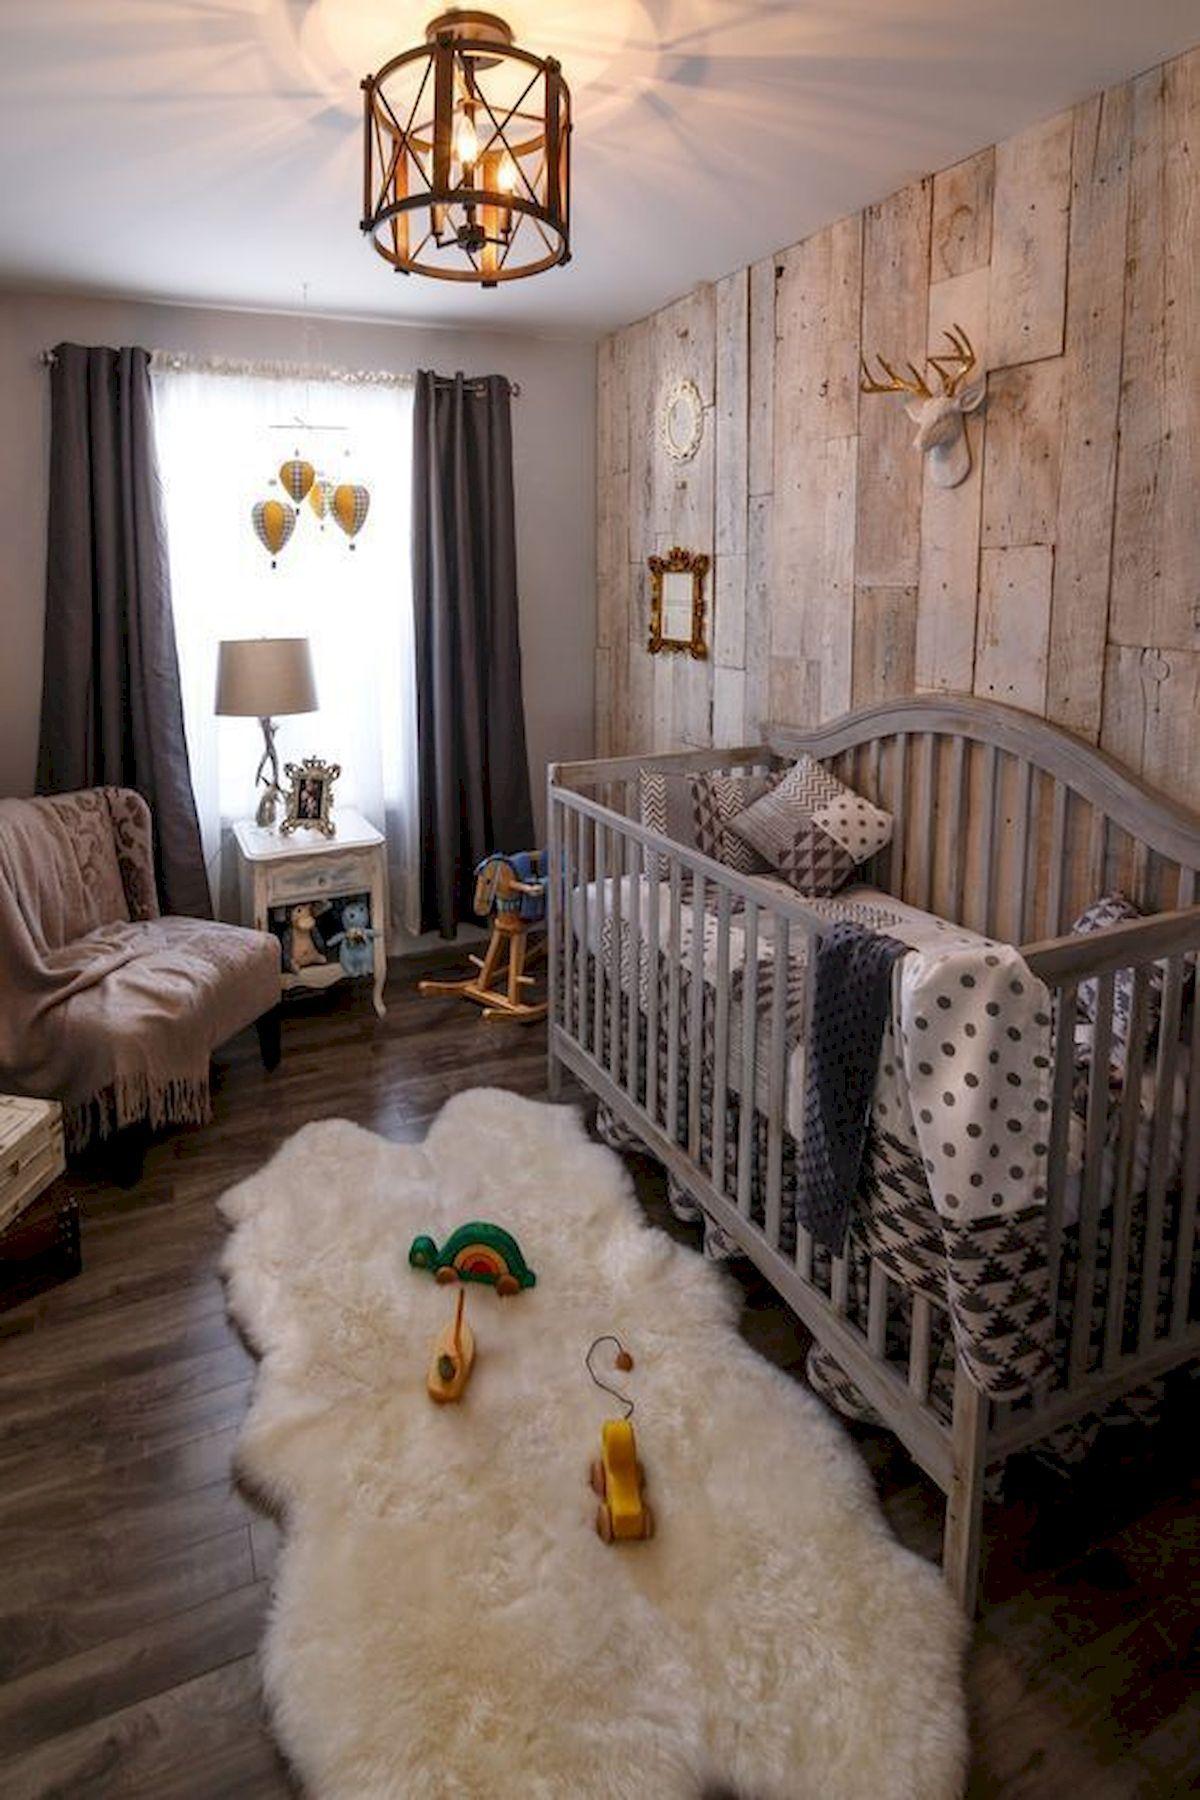 30 Adorable Rustic Nursery Room Ideas images